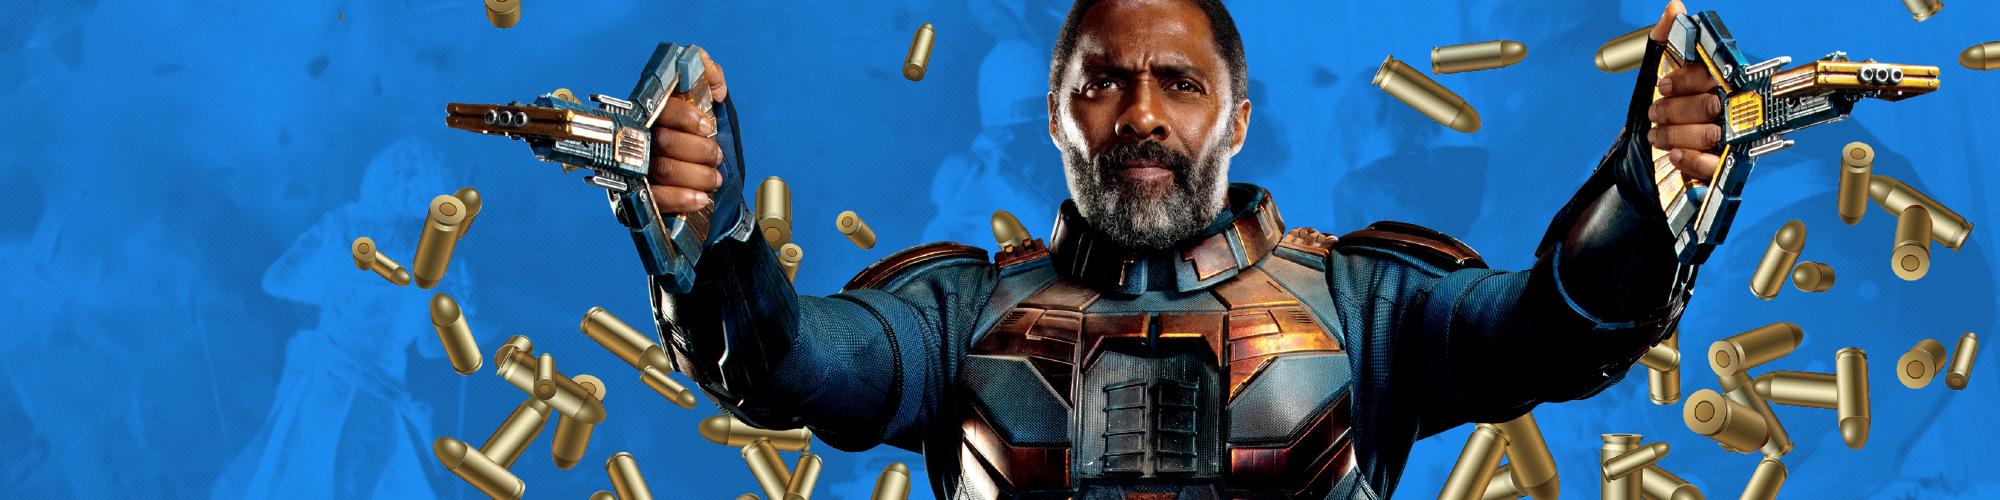 Idris Elba Bloodsport Suicide Squad Hero Image